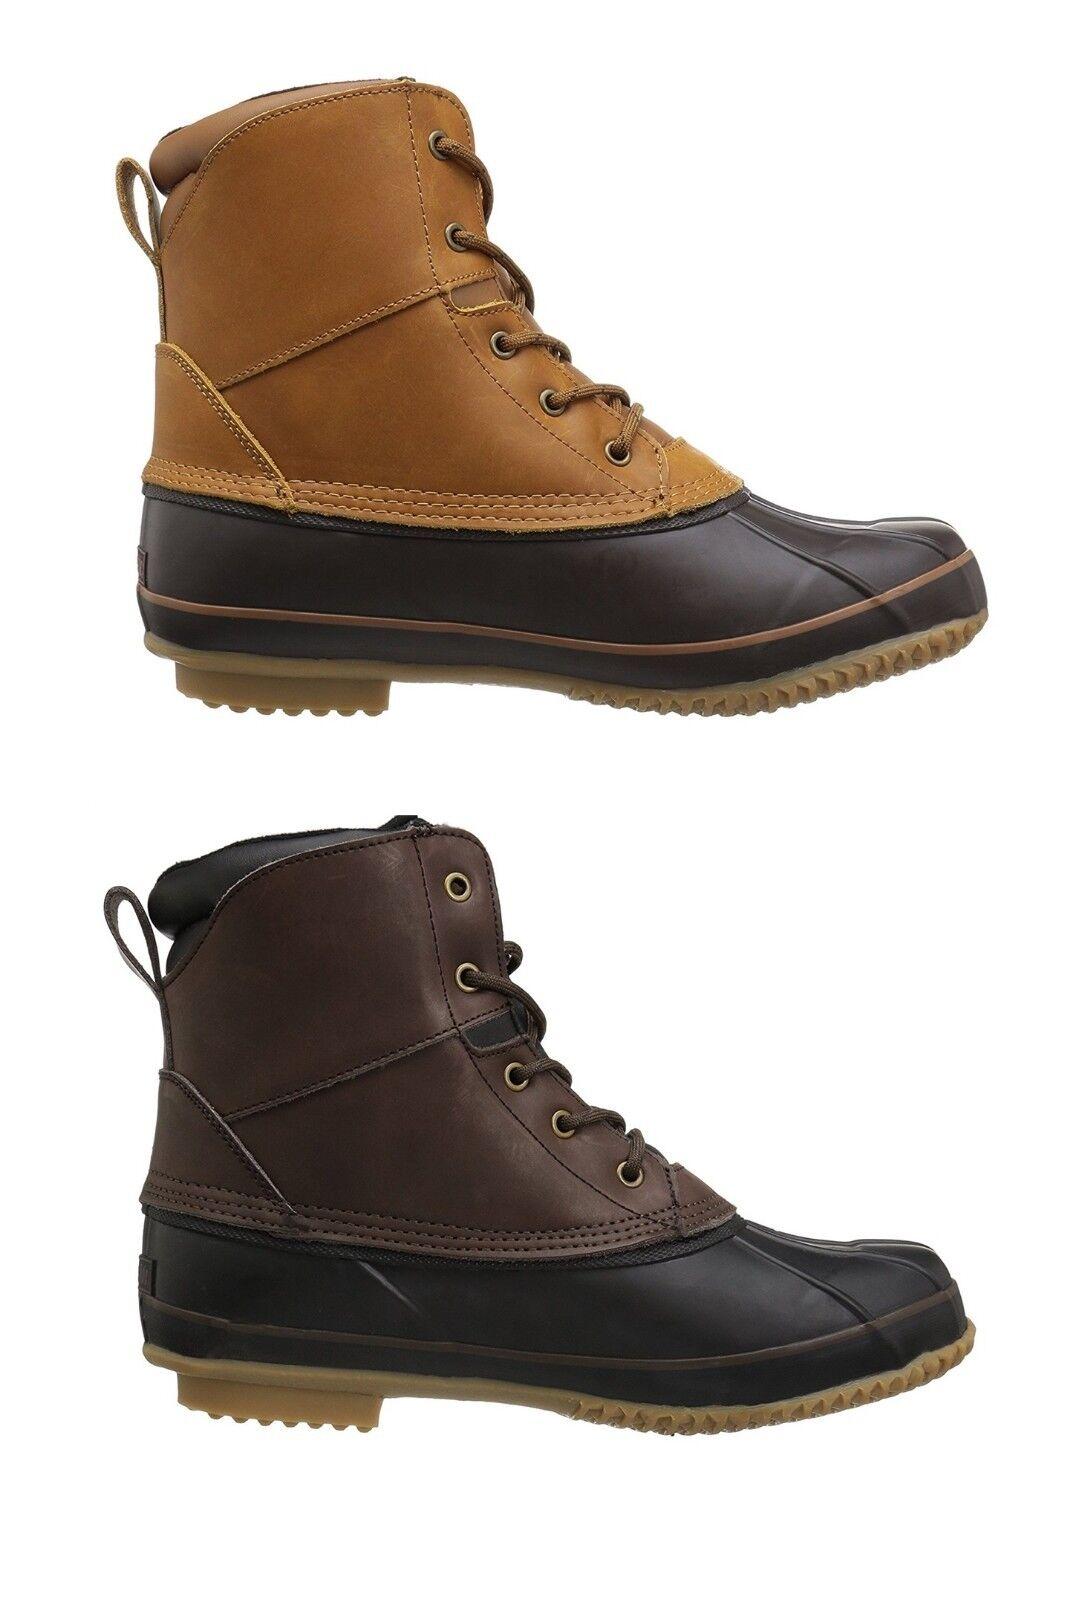 Northside Men's Lewiston Waterproof 200G -25F Insulated Winter Rain Duck Boots